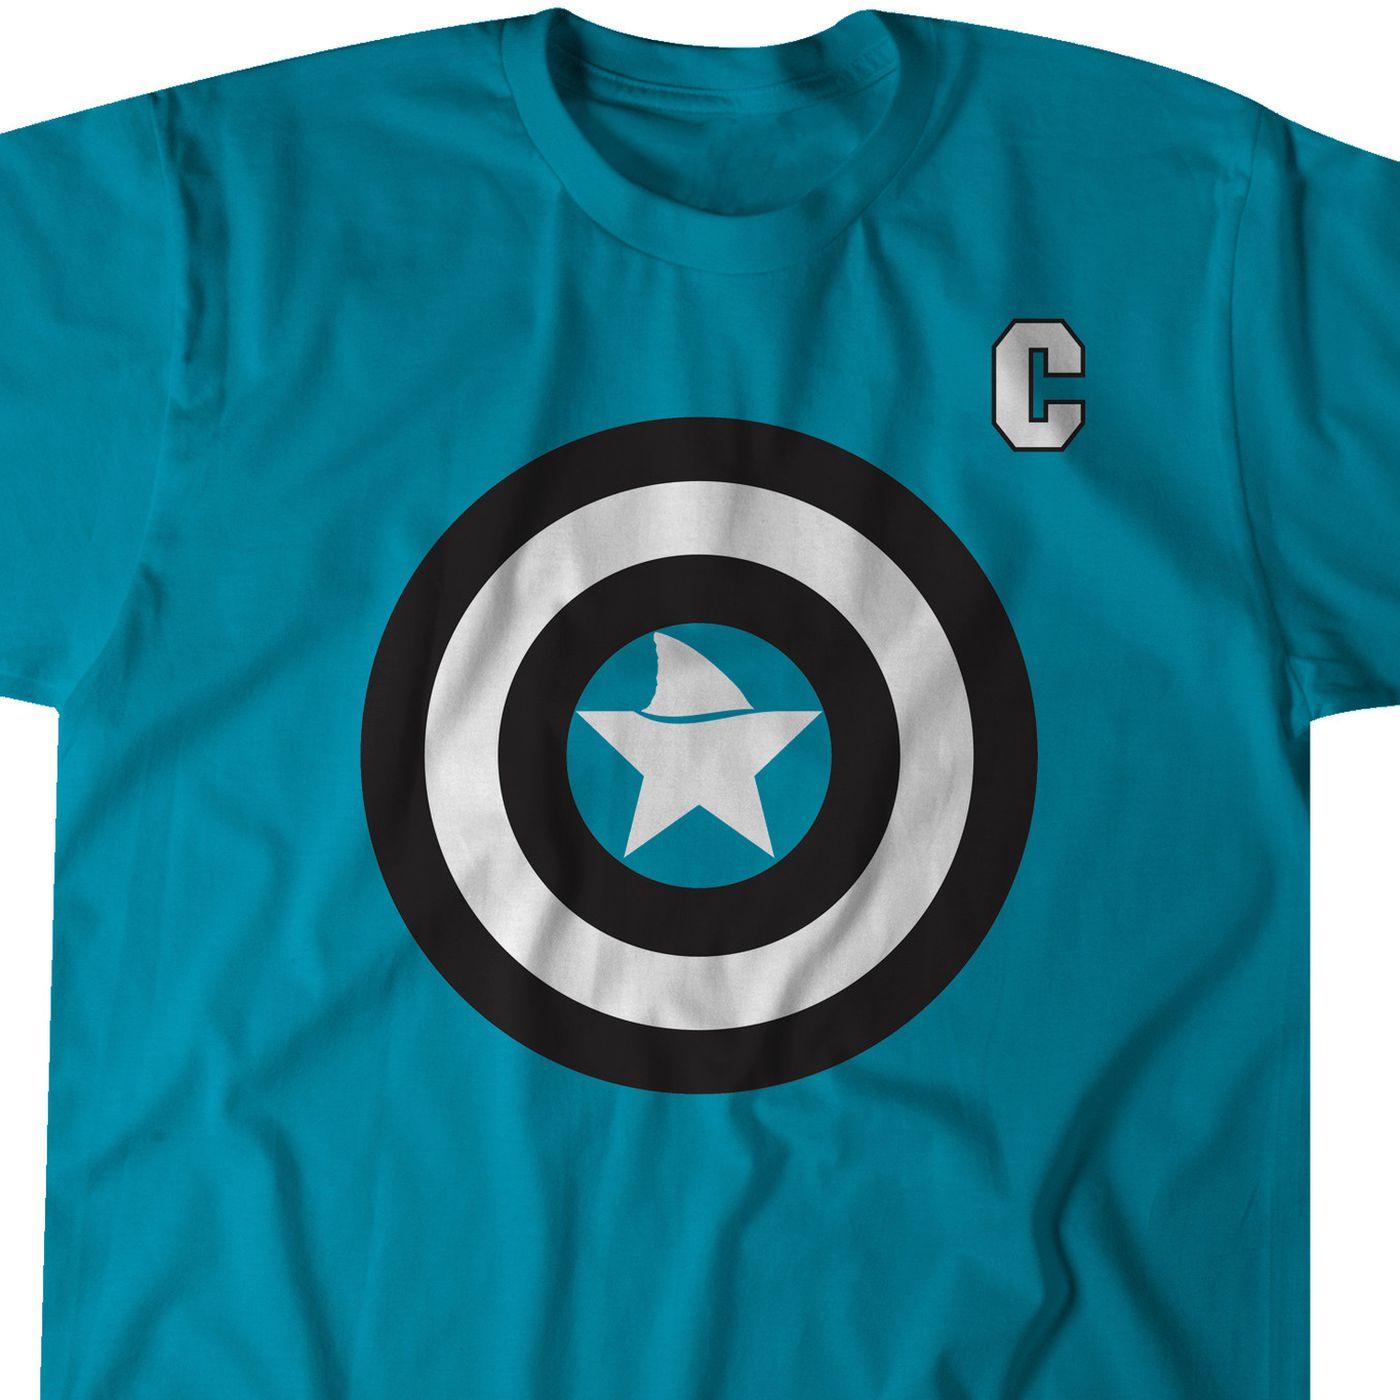 buy popular 9ae34 ac101 Joe Pavelski gets his shield with this Captain America shirt ...